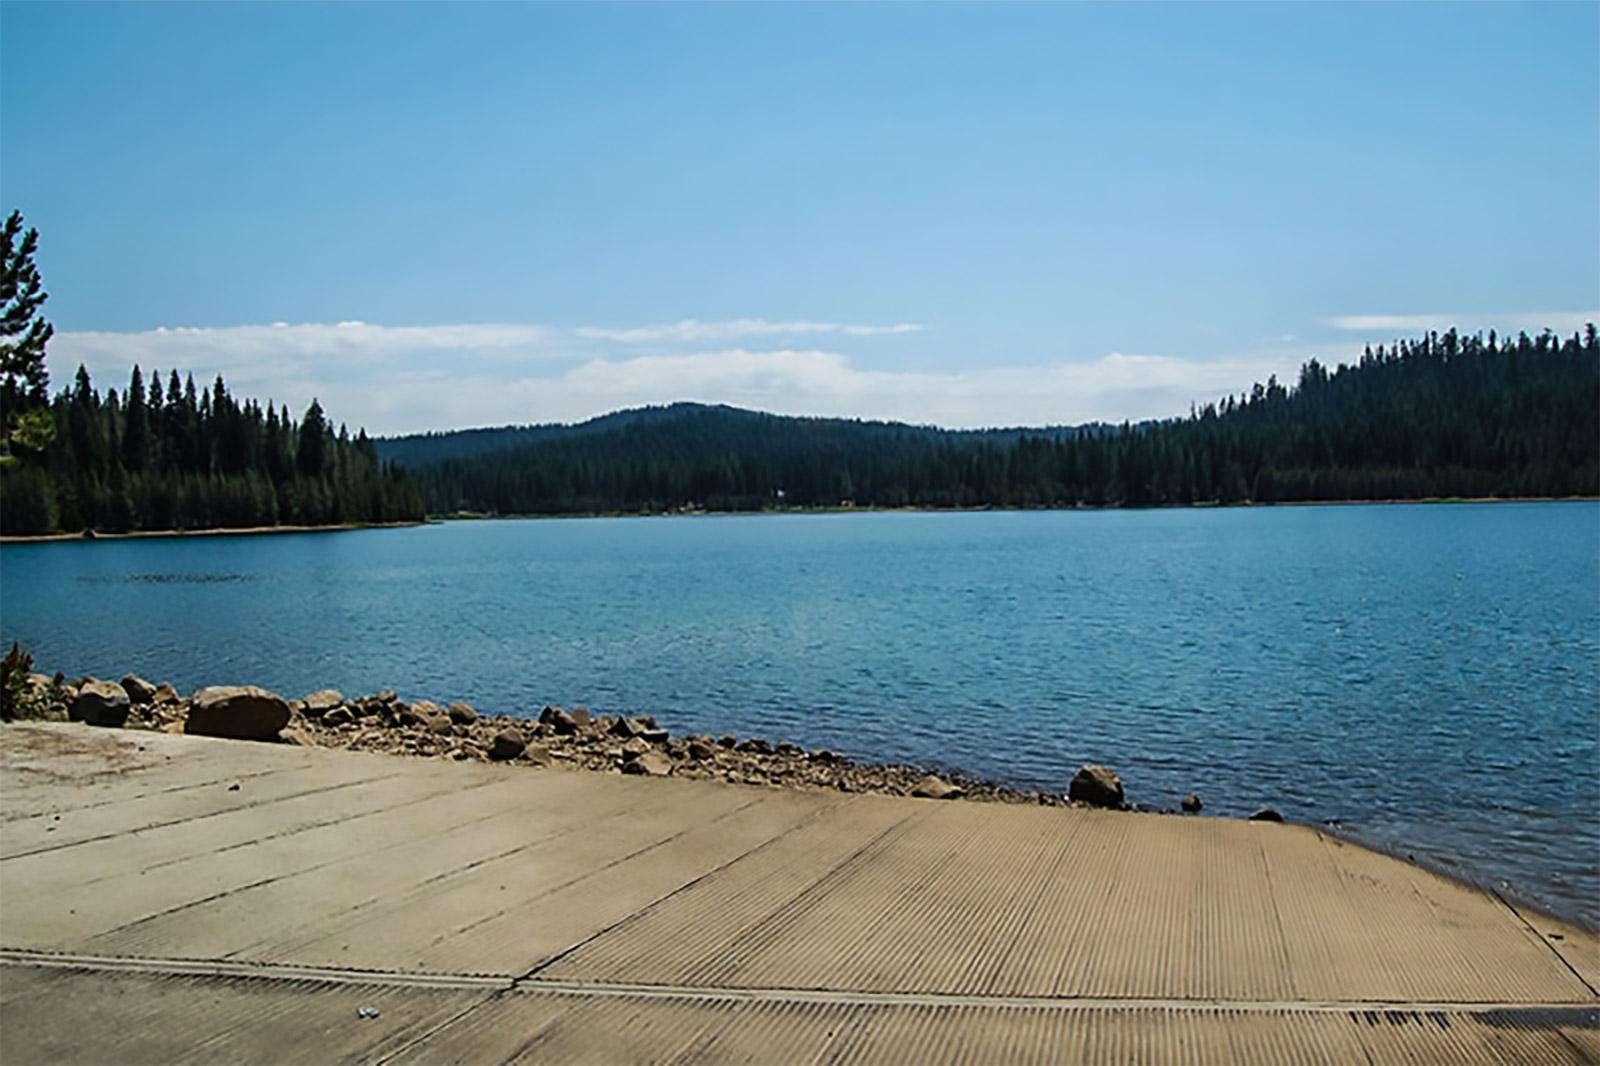 Little Grass Valley Reservoir at La Porte